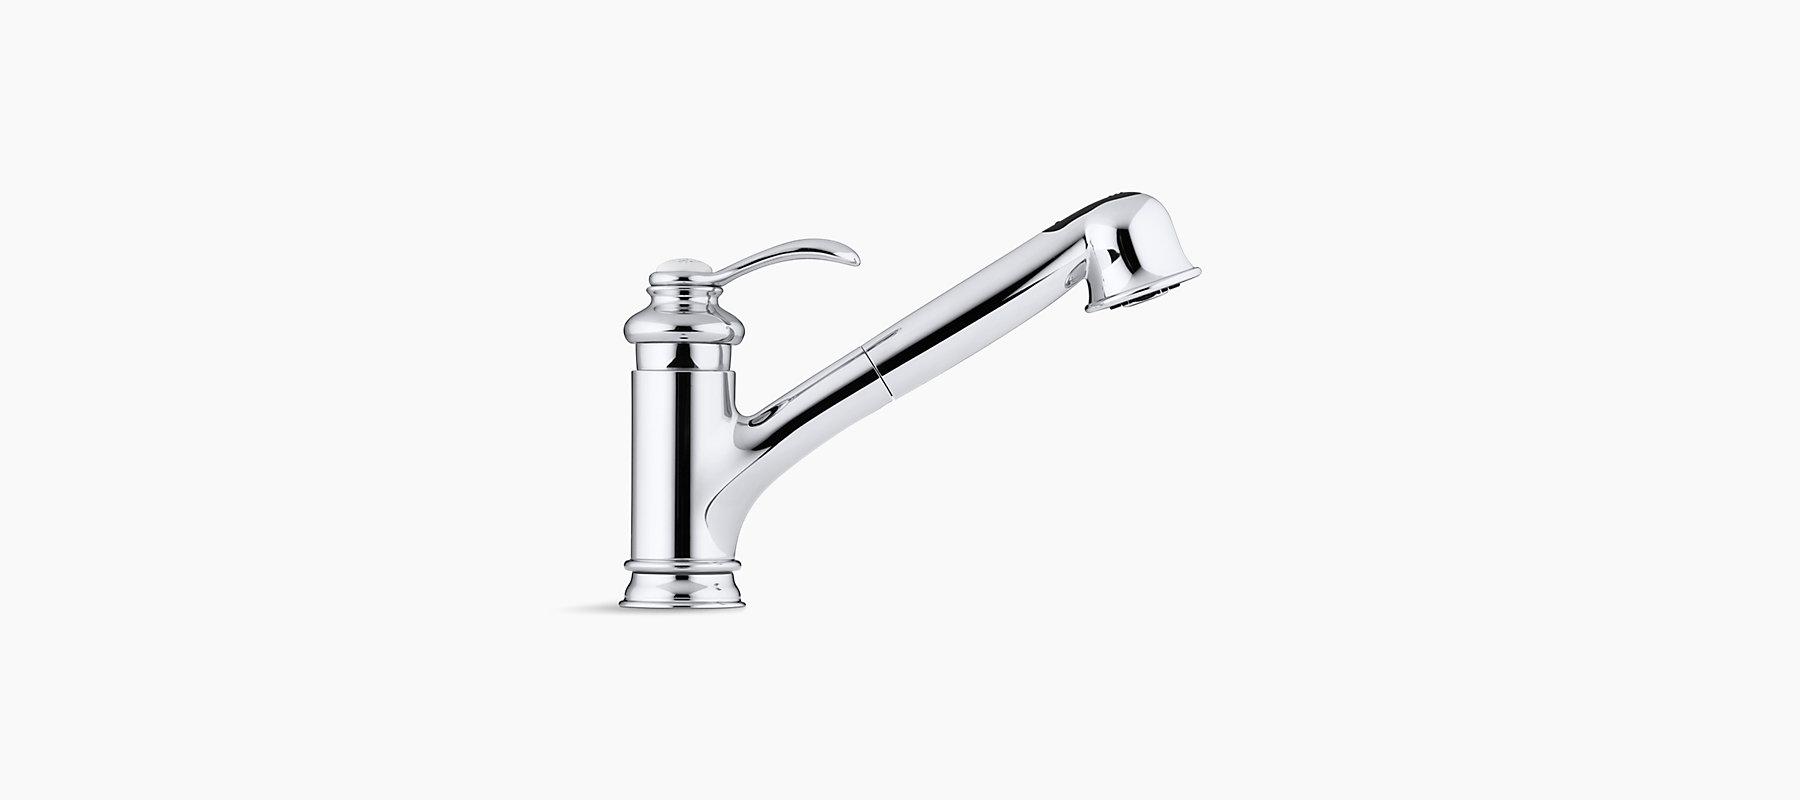 K 12177 Fairfax Single Handle Pull Out Kitchen Sink Faucet Kohler